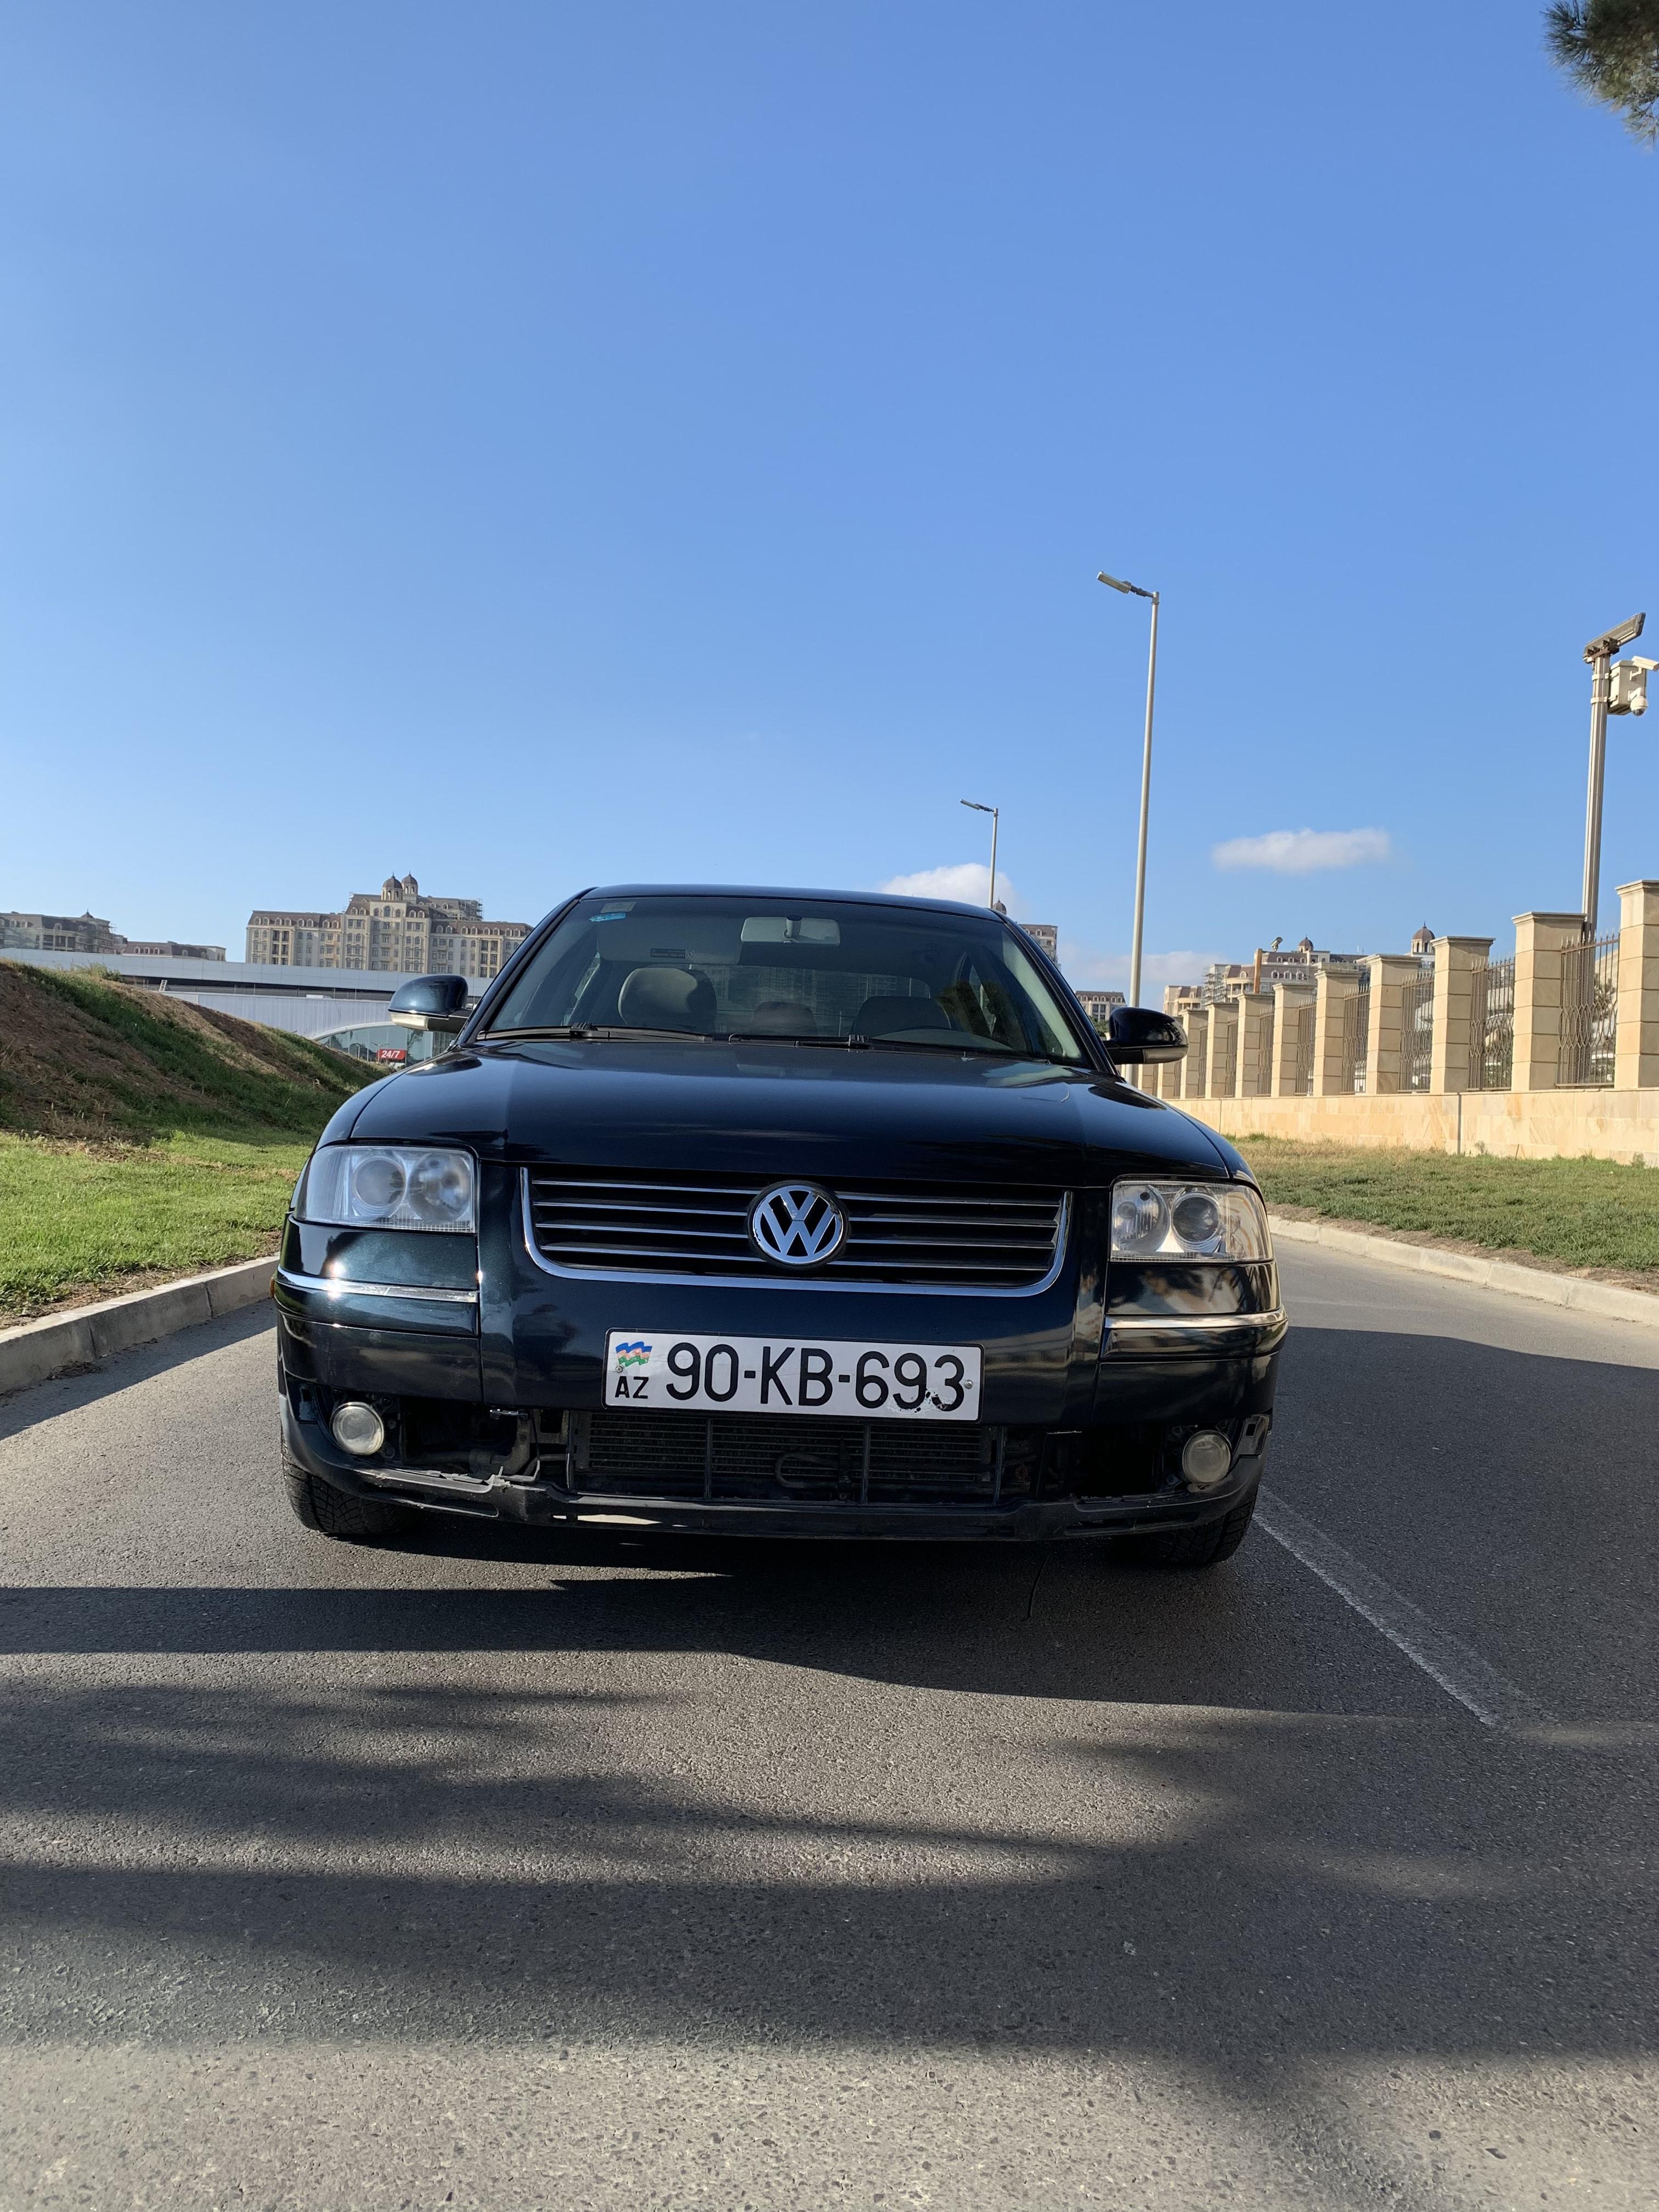 Volkswagen Passat 1.8(lt) 2004 Подержанный  $4529